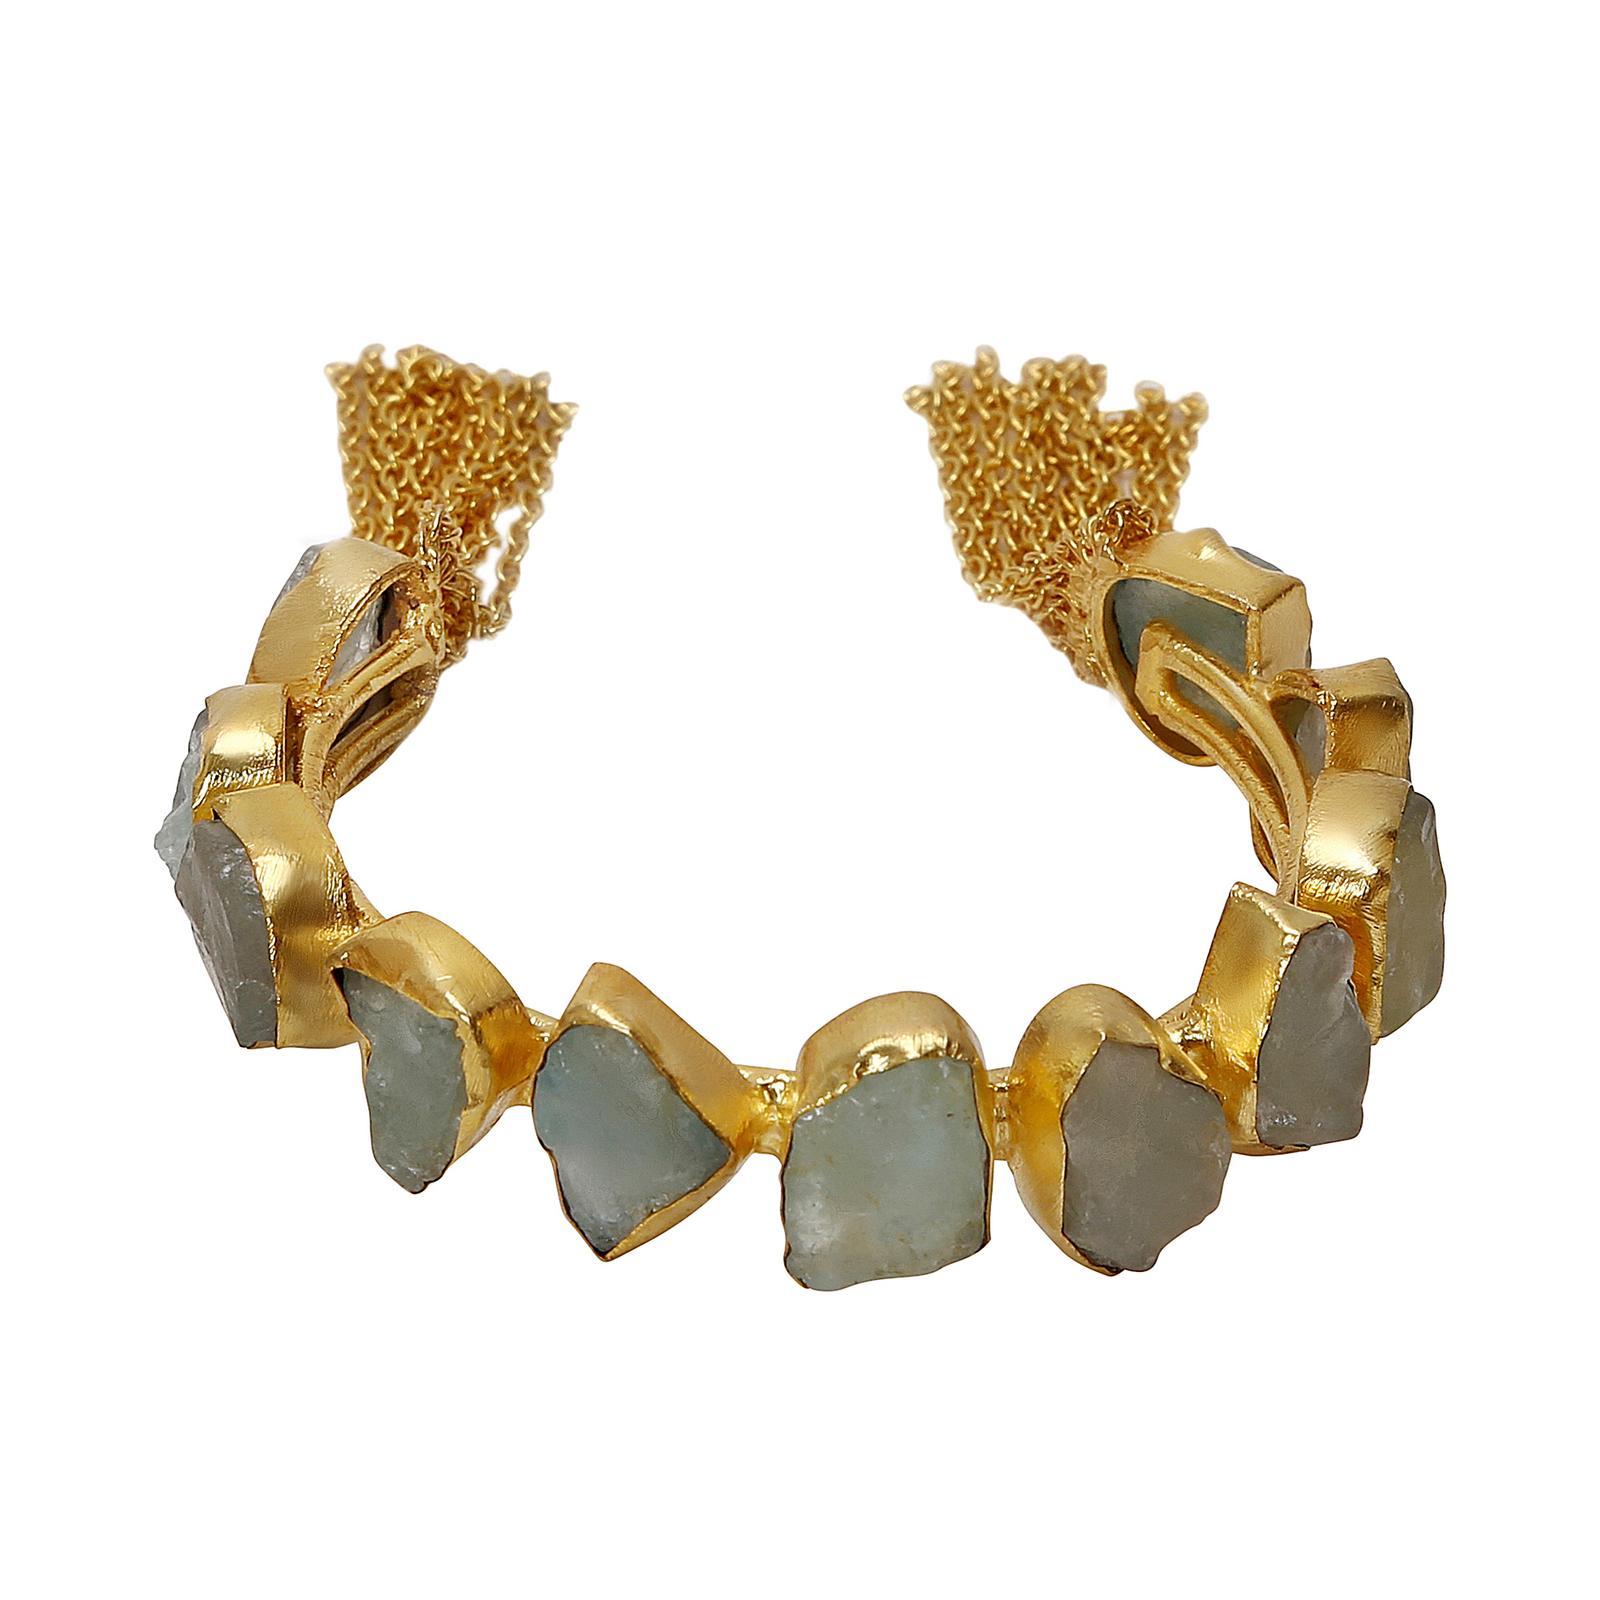 Stone Cuffs